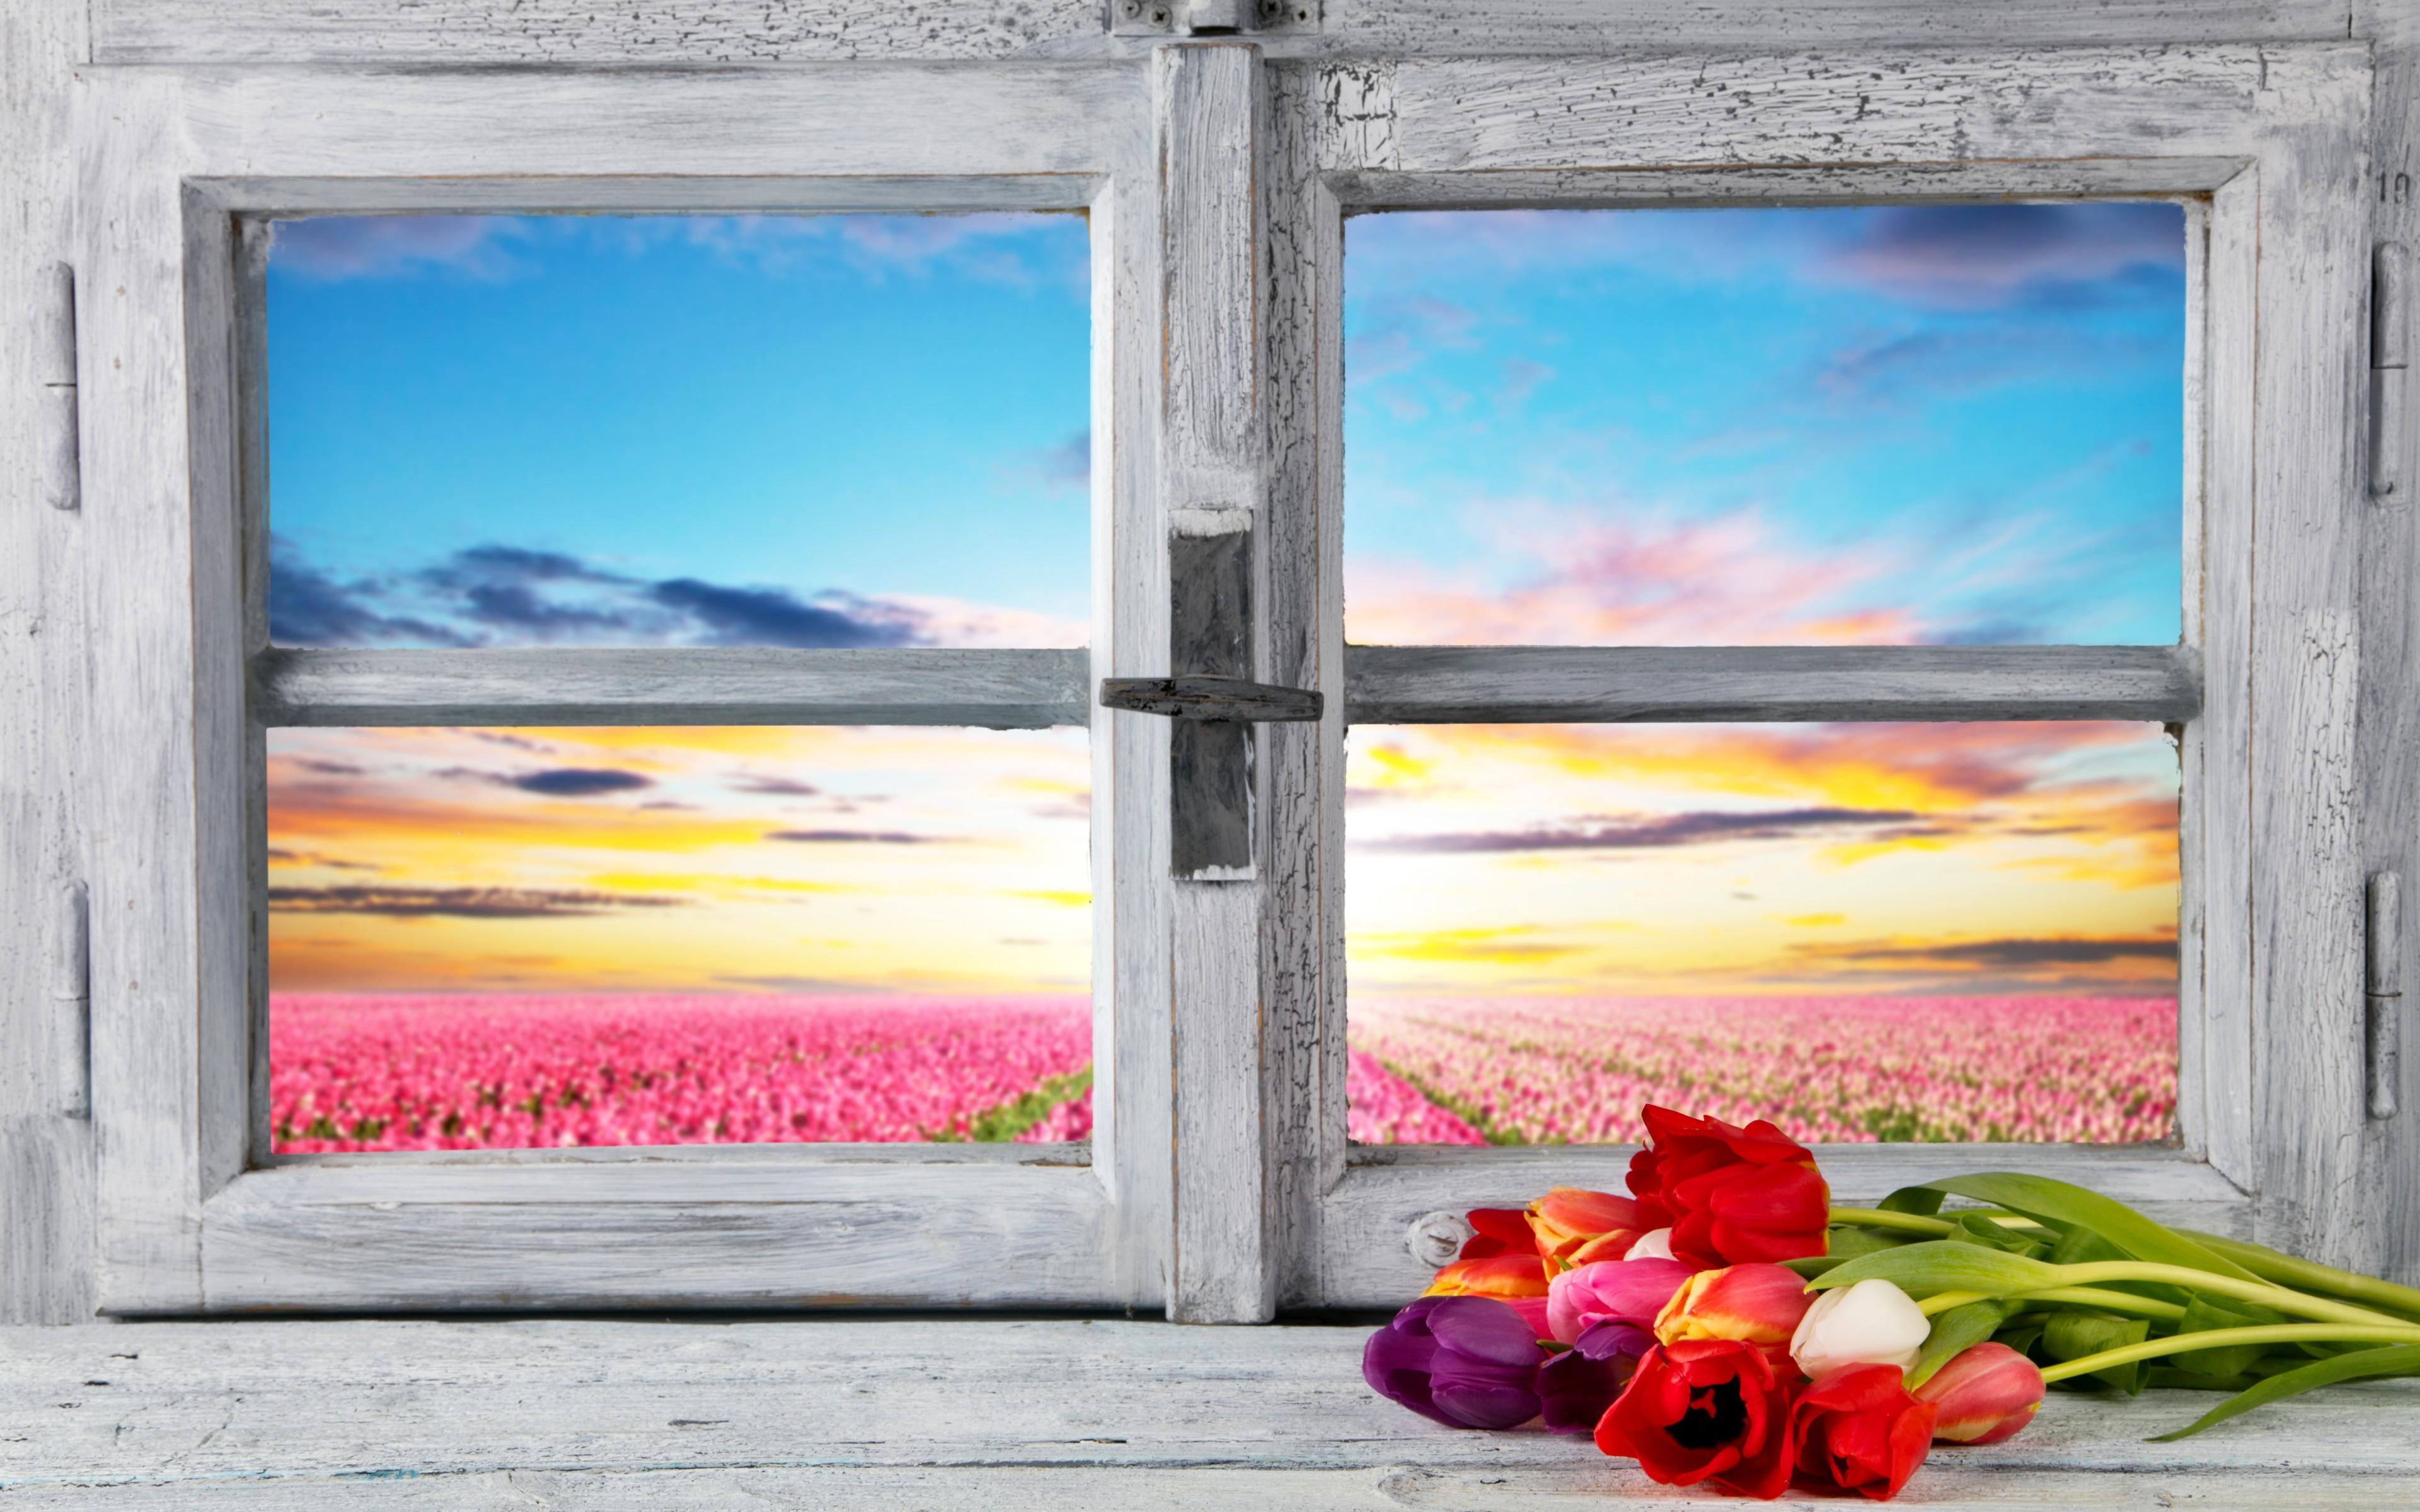 Fondos de pantalla : luz de sol, paisaje, pintura, ventana, Flores ...